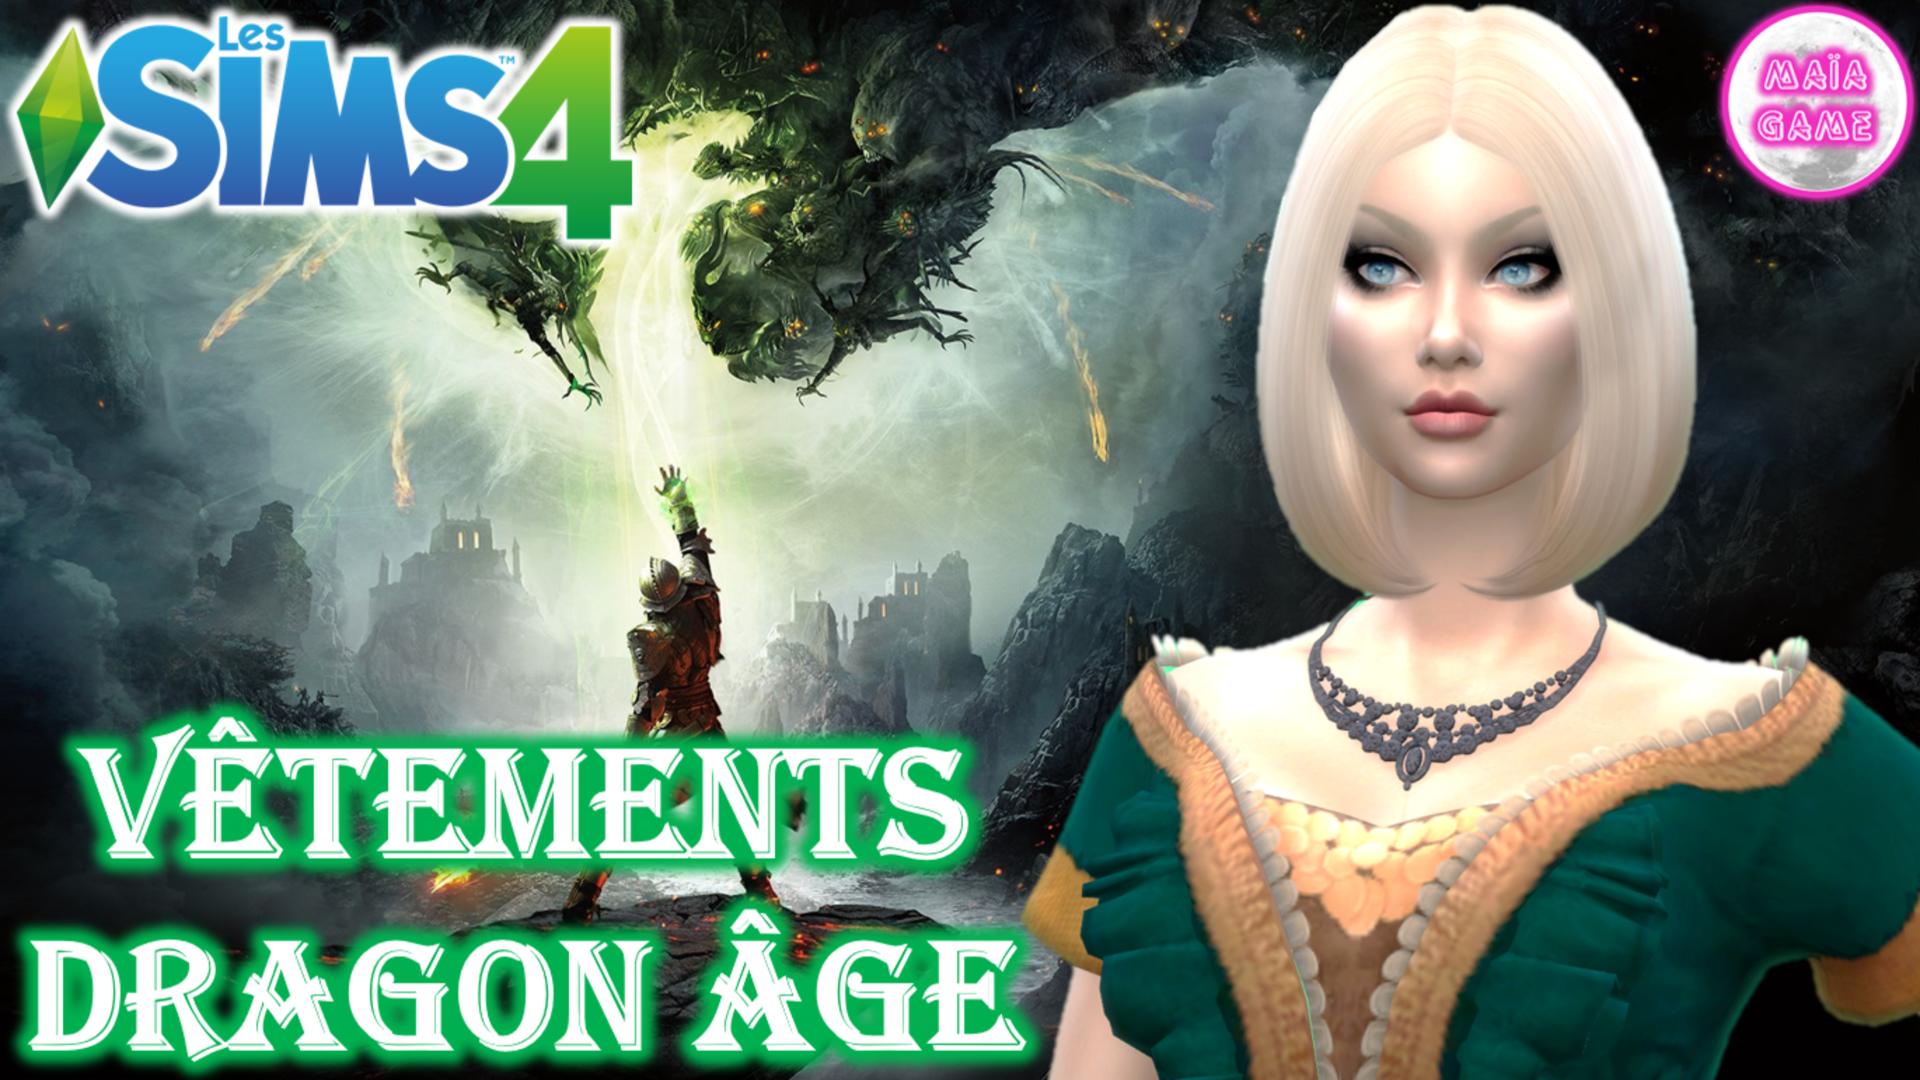 Dragon Age sims 4